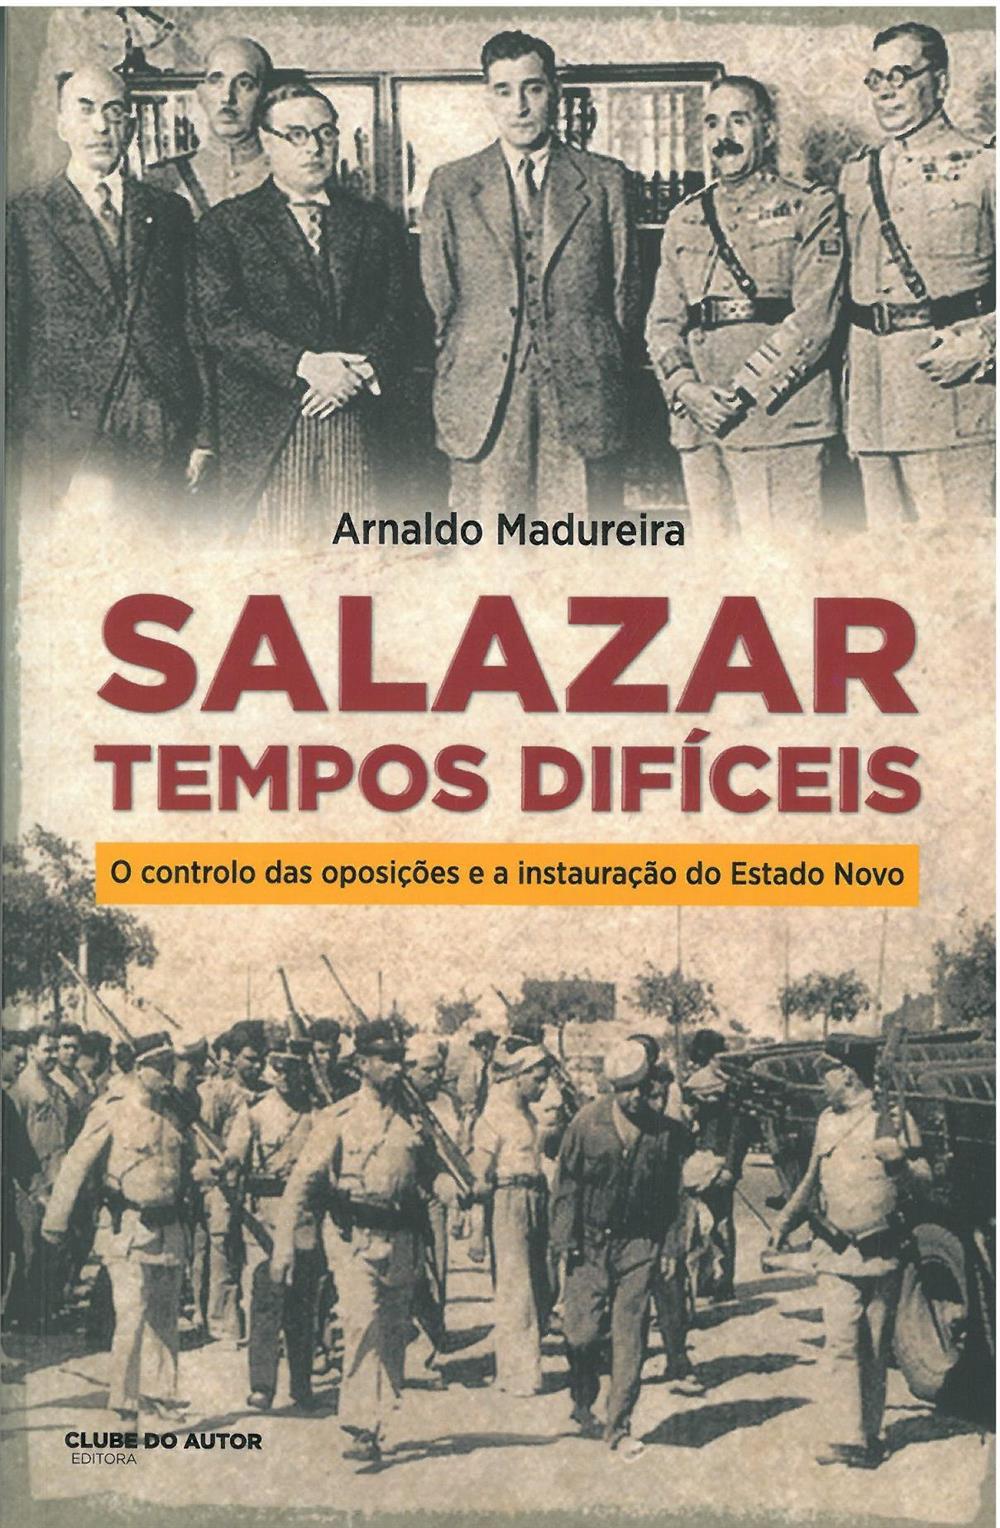 Salazar_tempos difíceis_.jpg